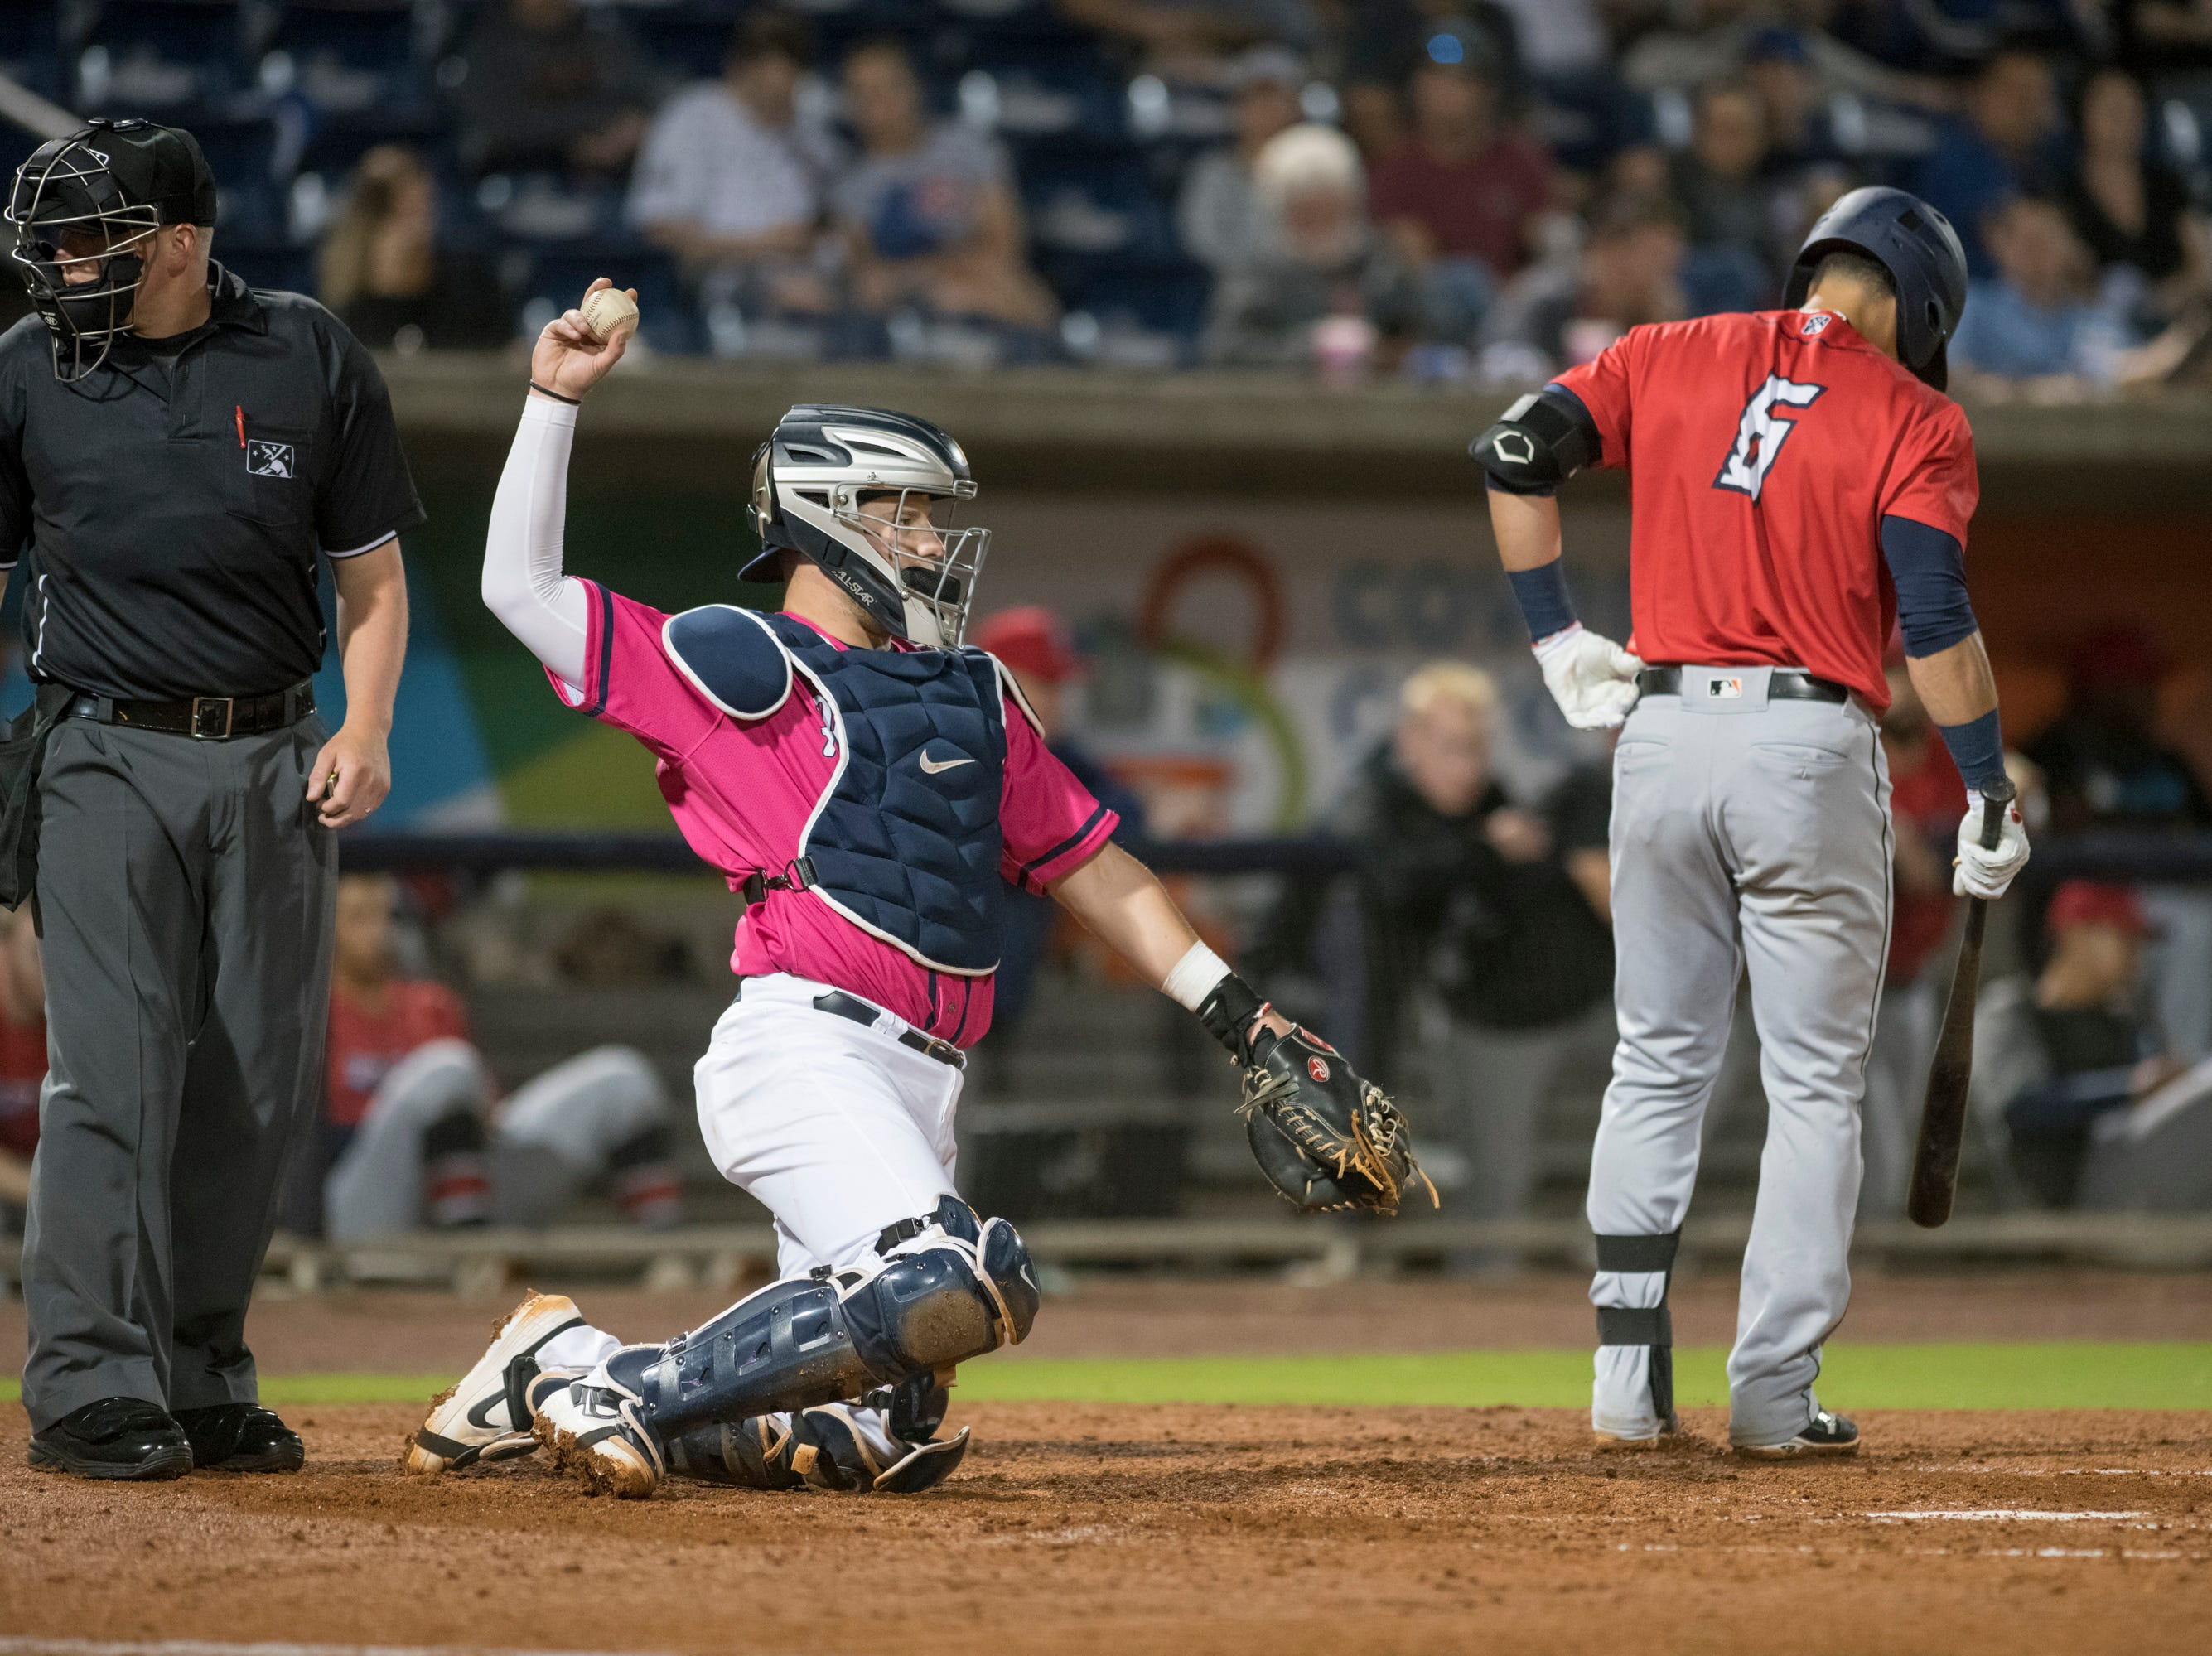 Caleb Hamilton (24) catches during the Jacksonville Jumbo Shrimp vs Pensacola Blue Wahoos baseball game in Pensacola on Friday, April 12, 2019.